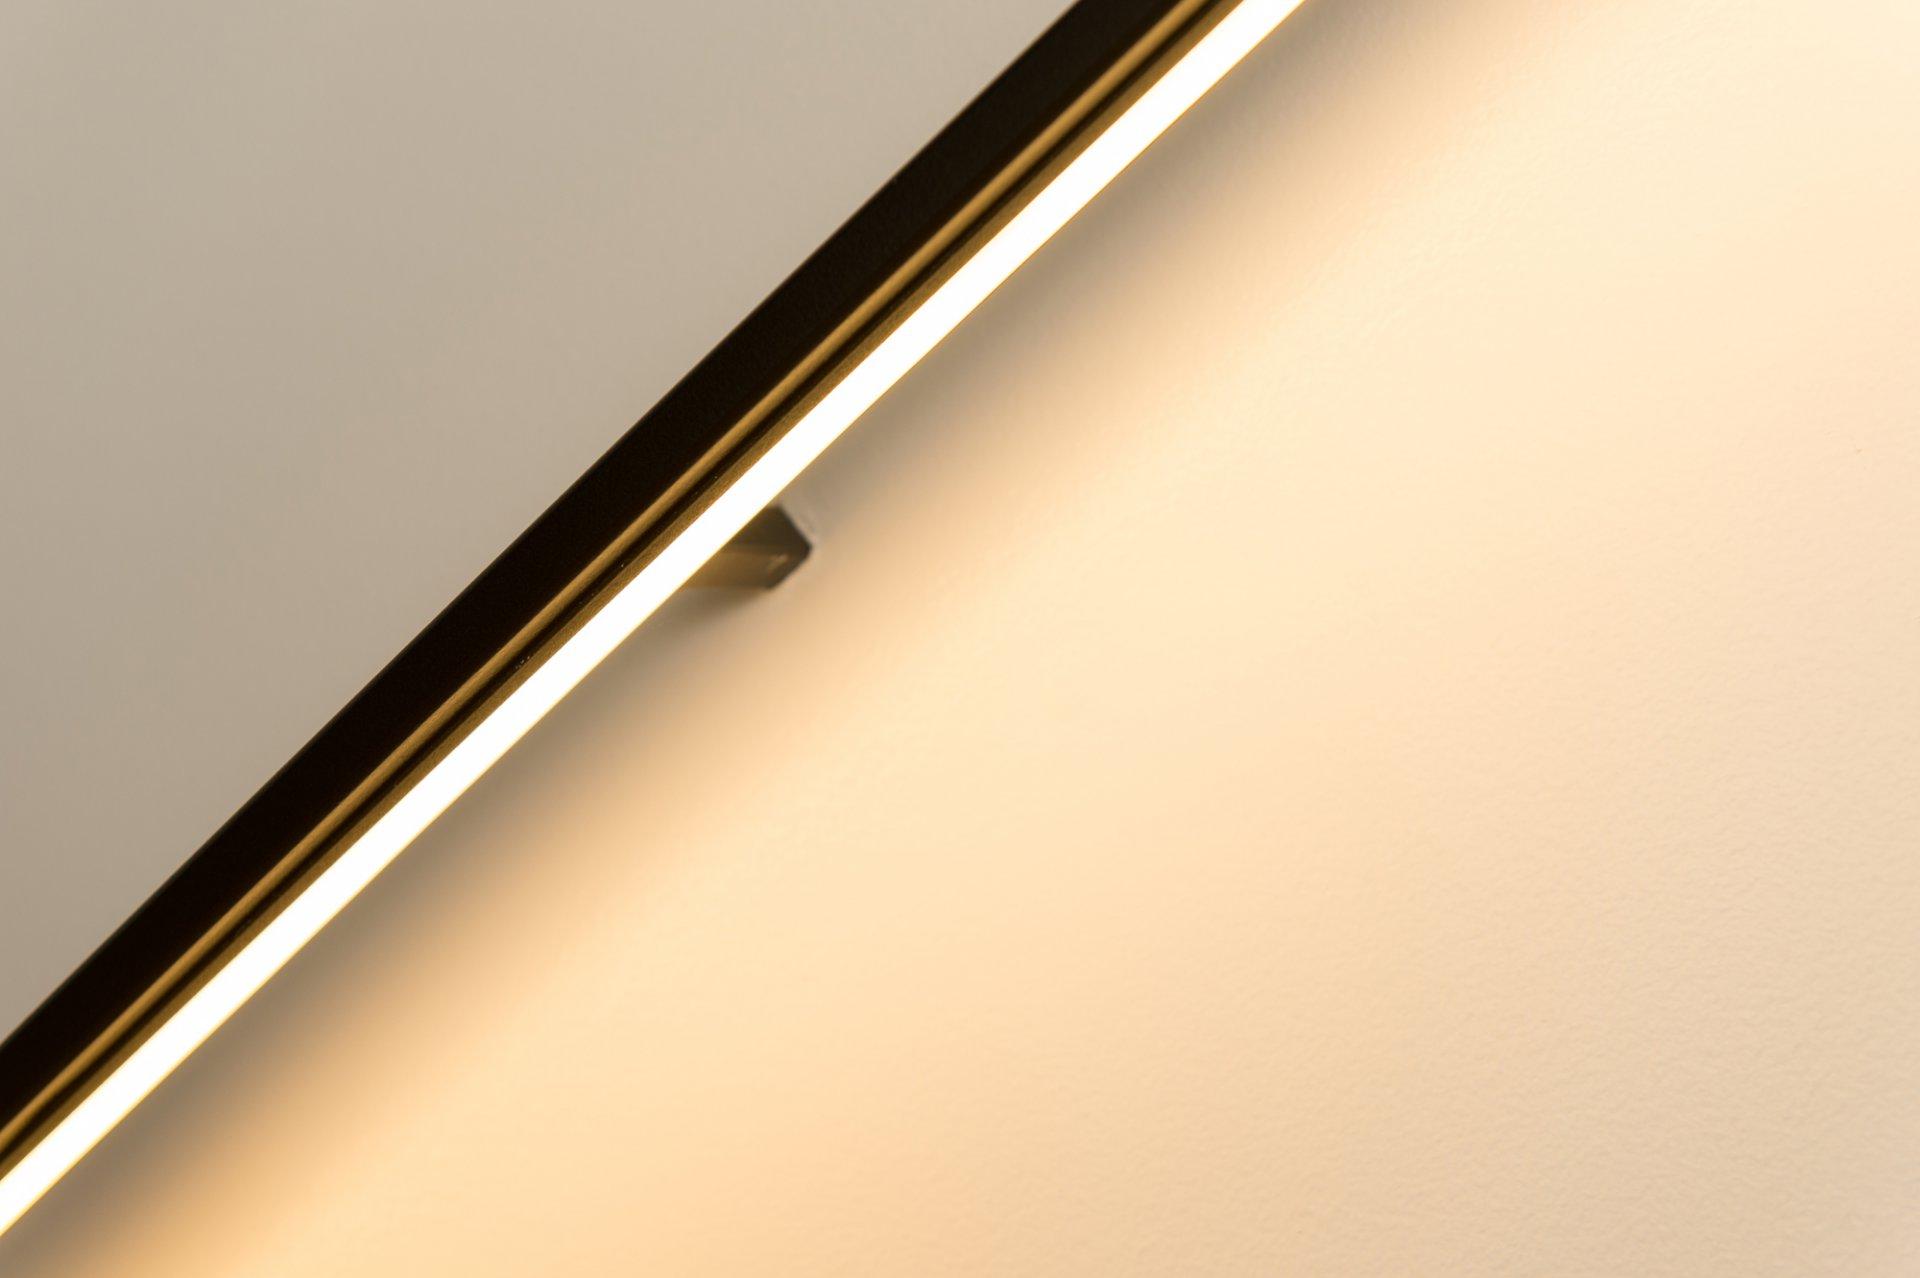 LED-verlichting Decotrap